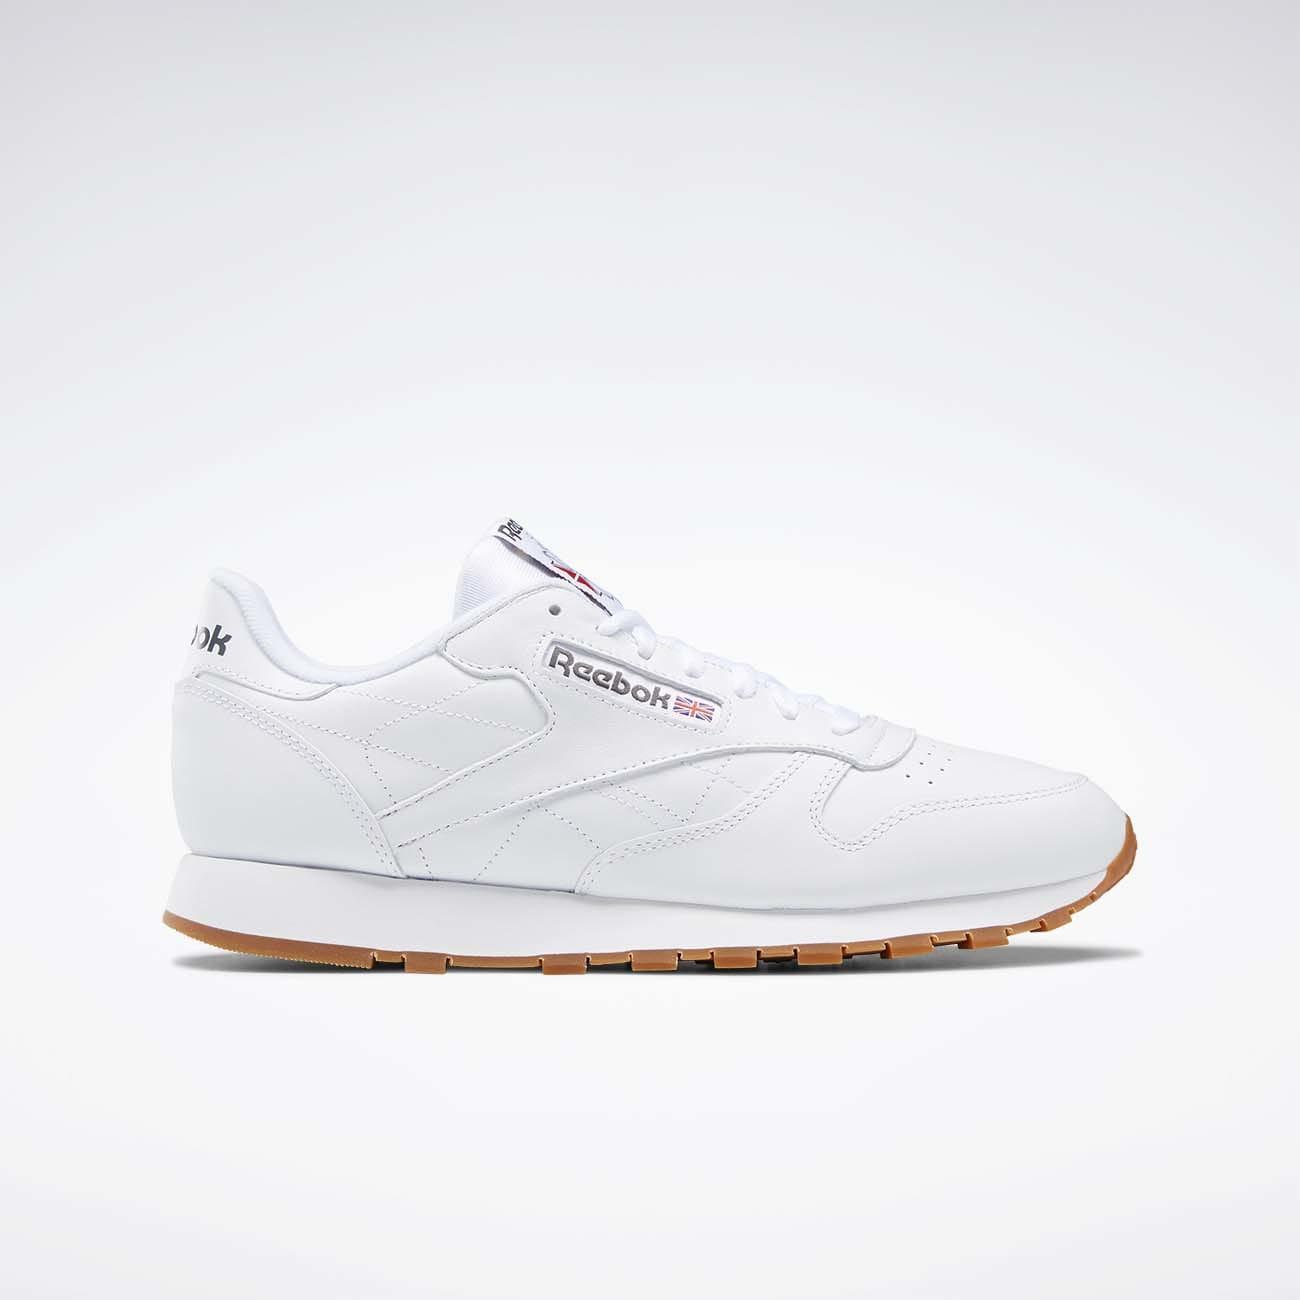 White Sneakers For Men In 2020